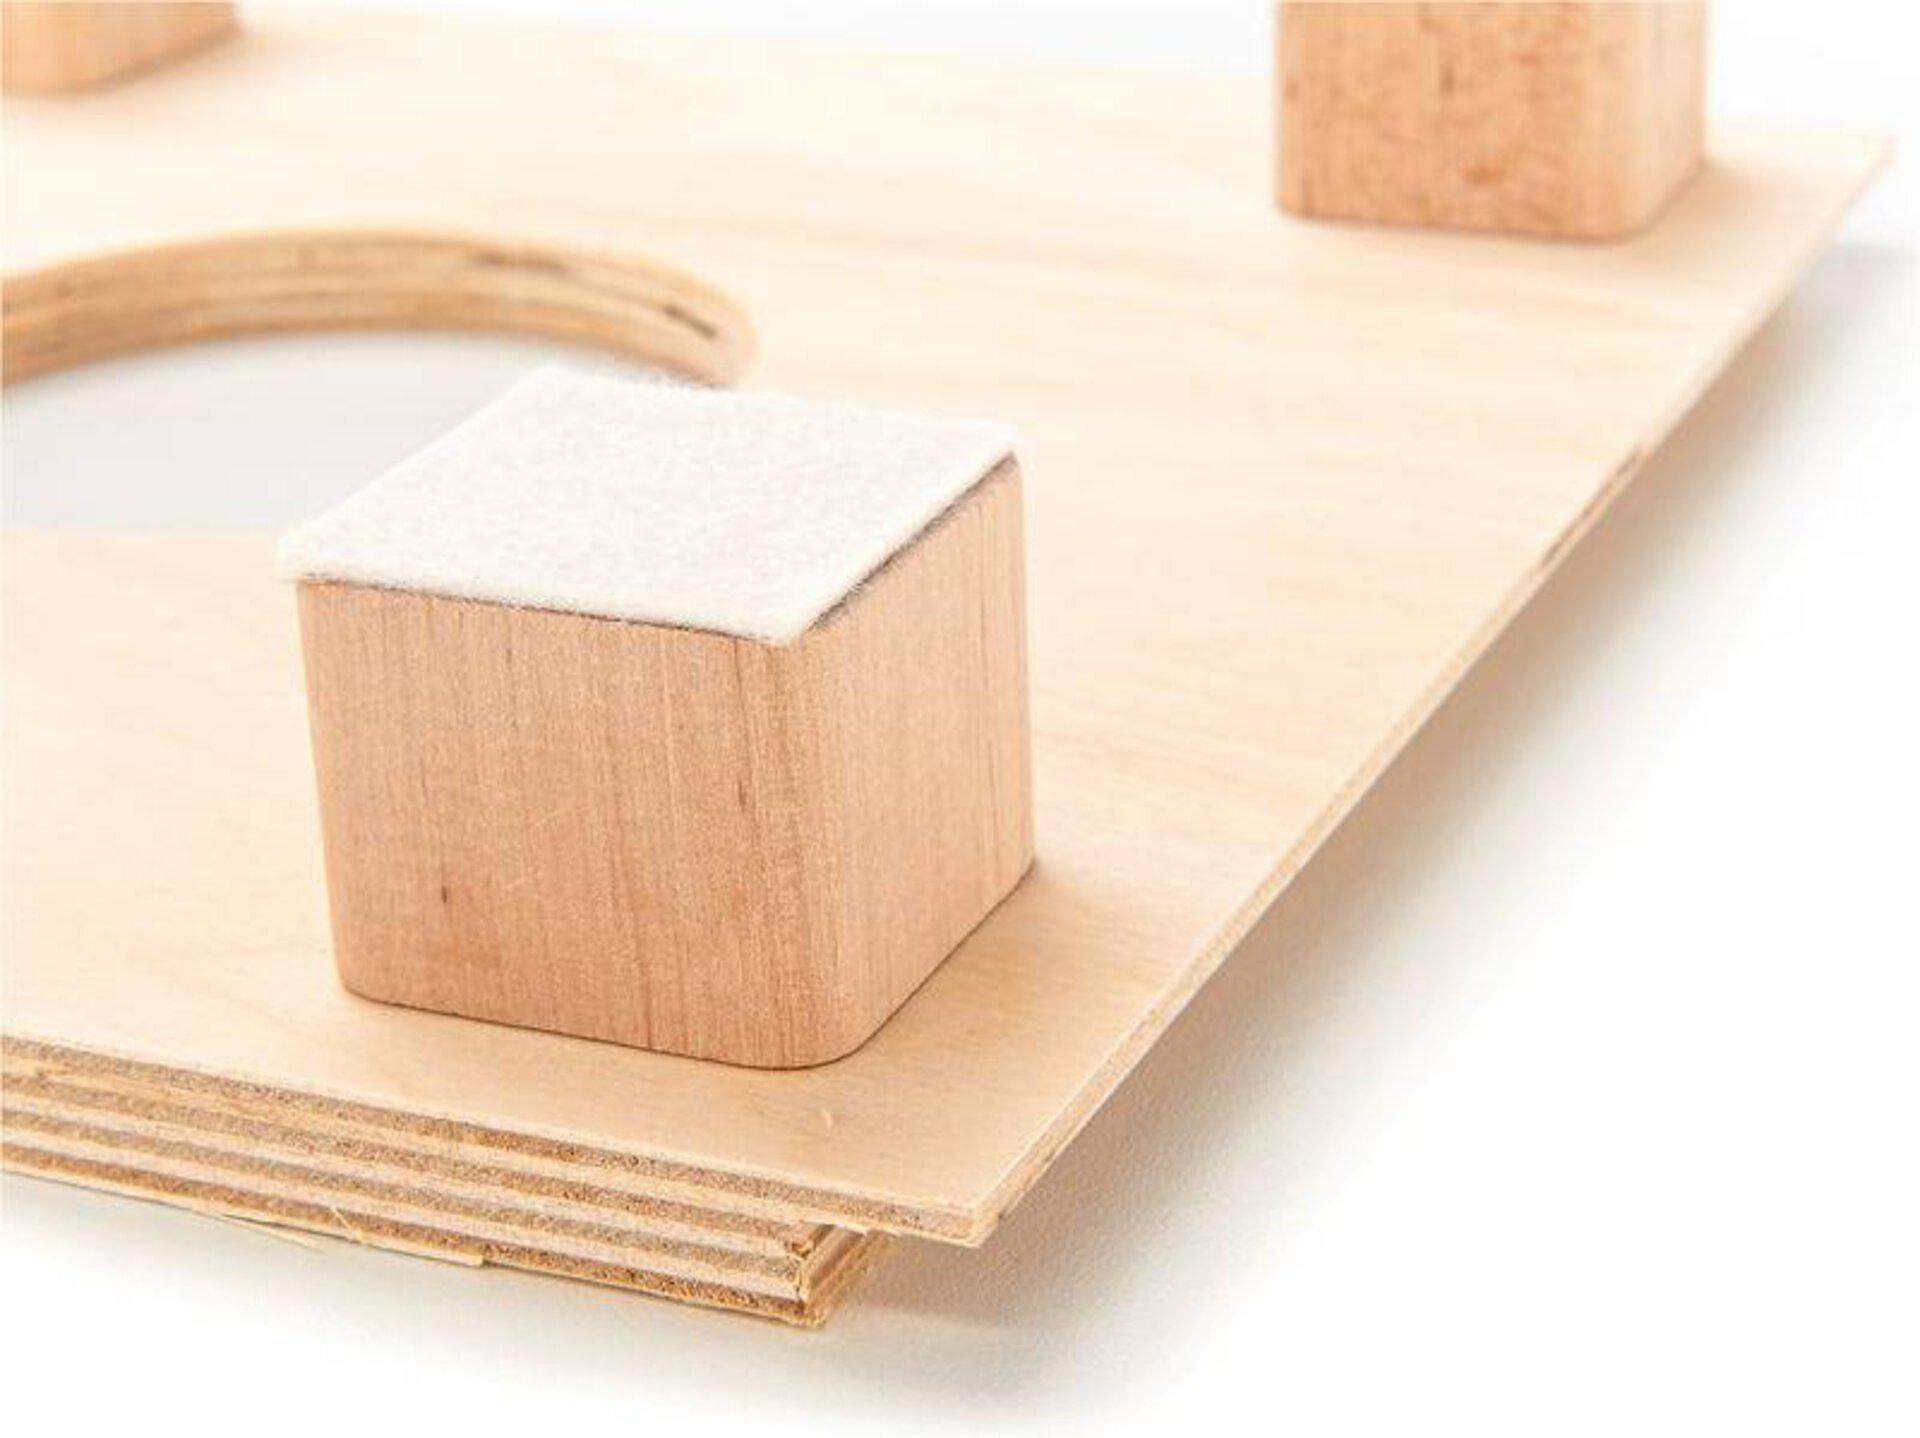 Hocker Kindertrommelhocker Baff Holz braun 26 x 38 x 26 cm